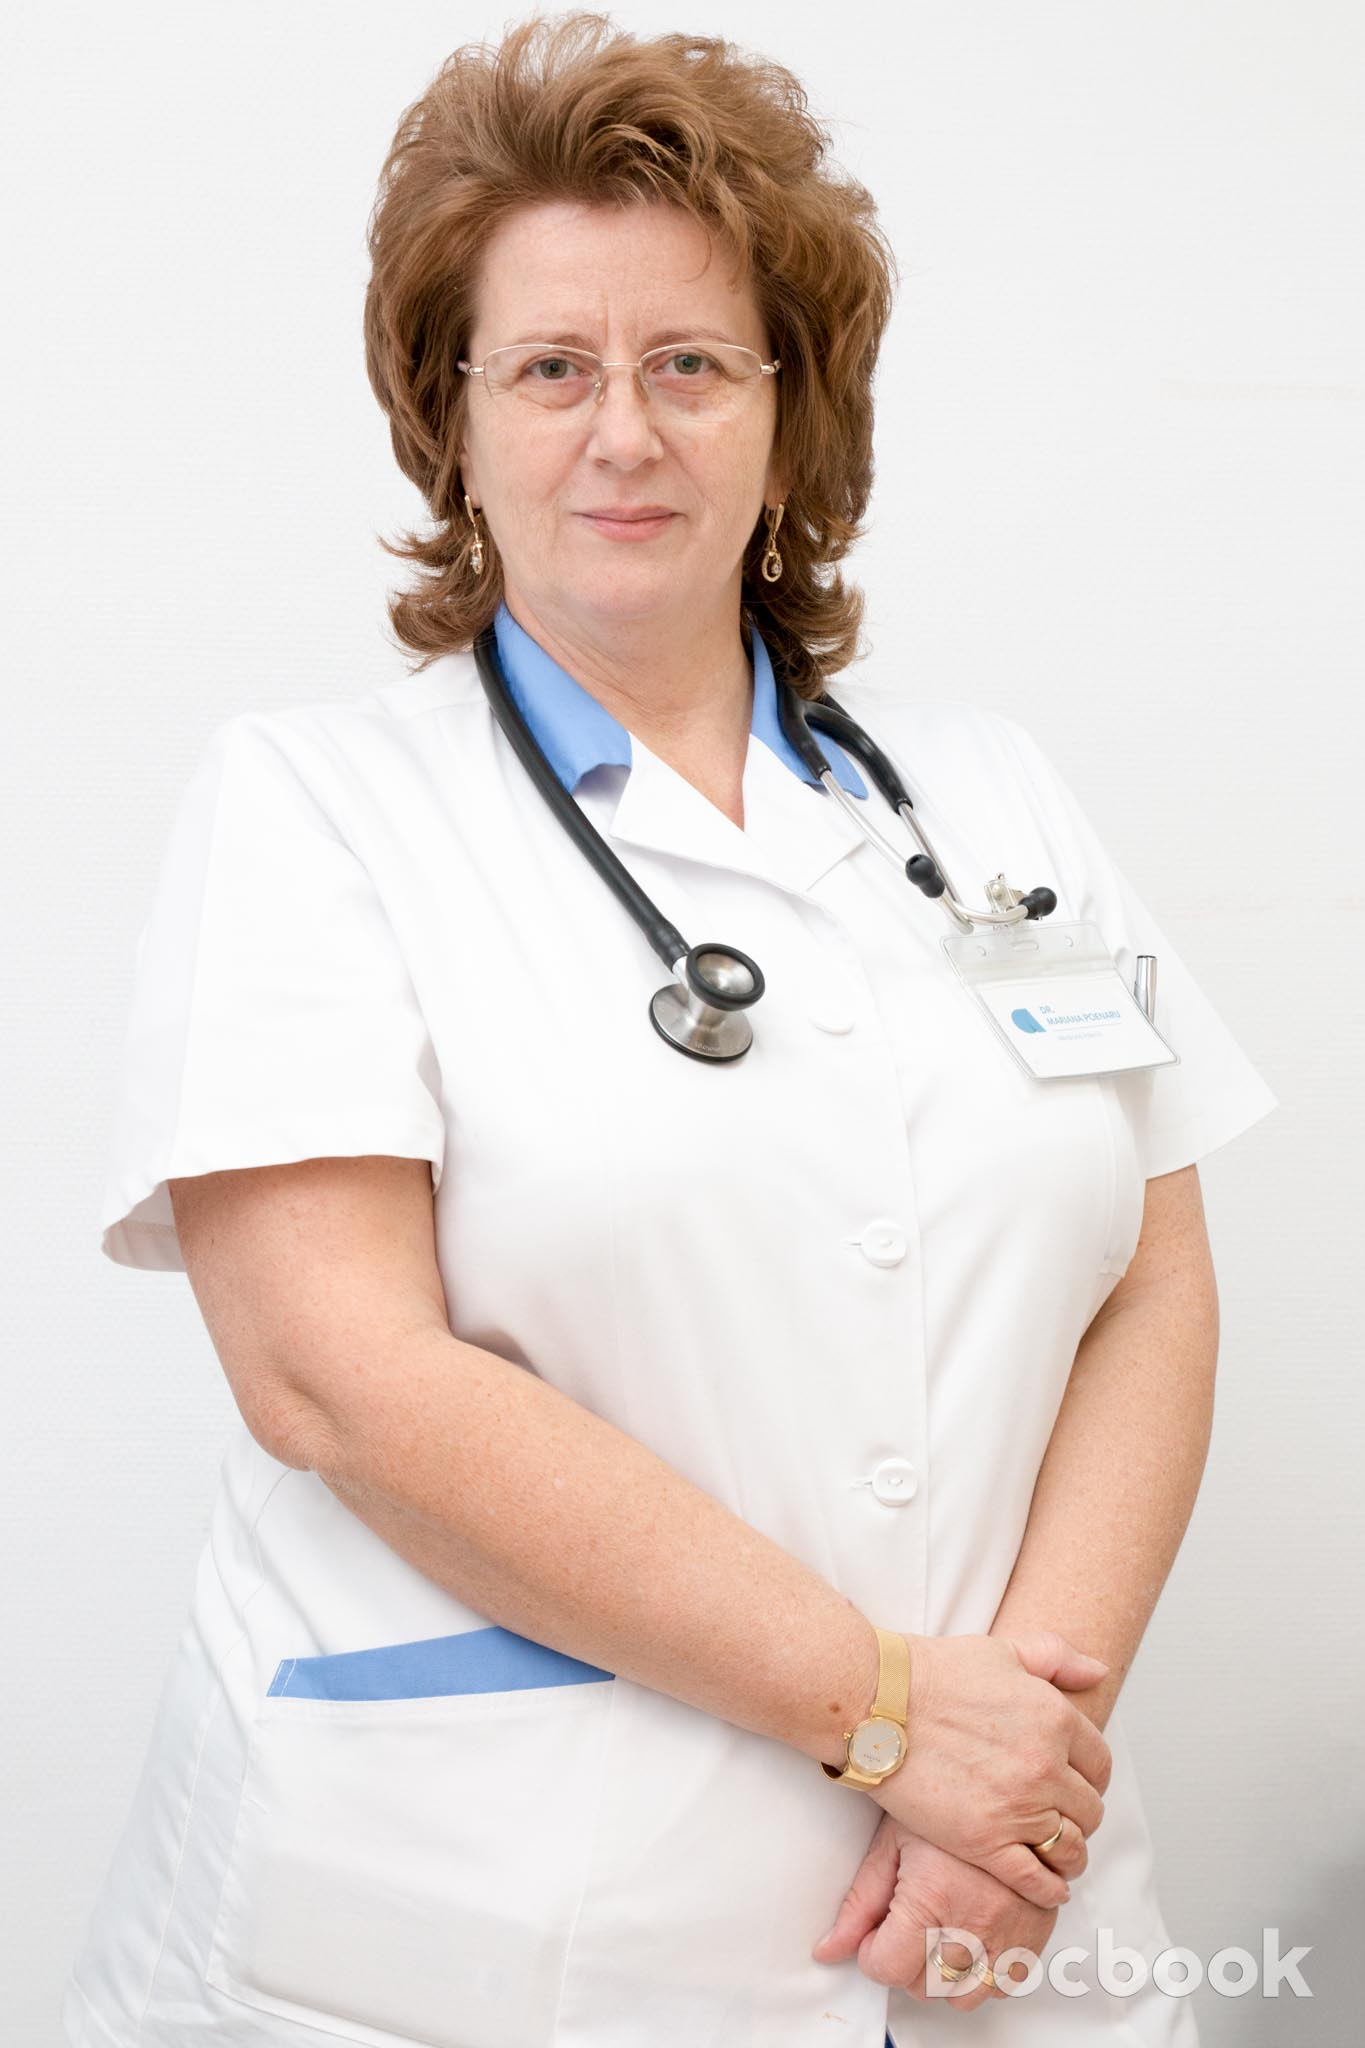 Dr. Mariana Poenaru